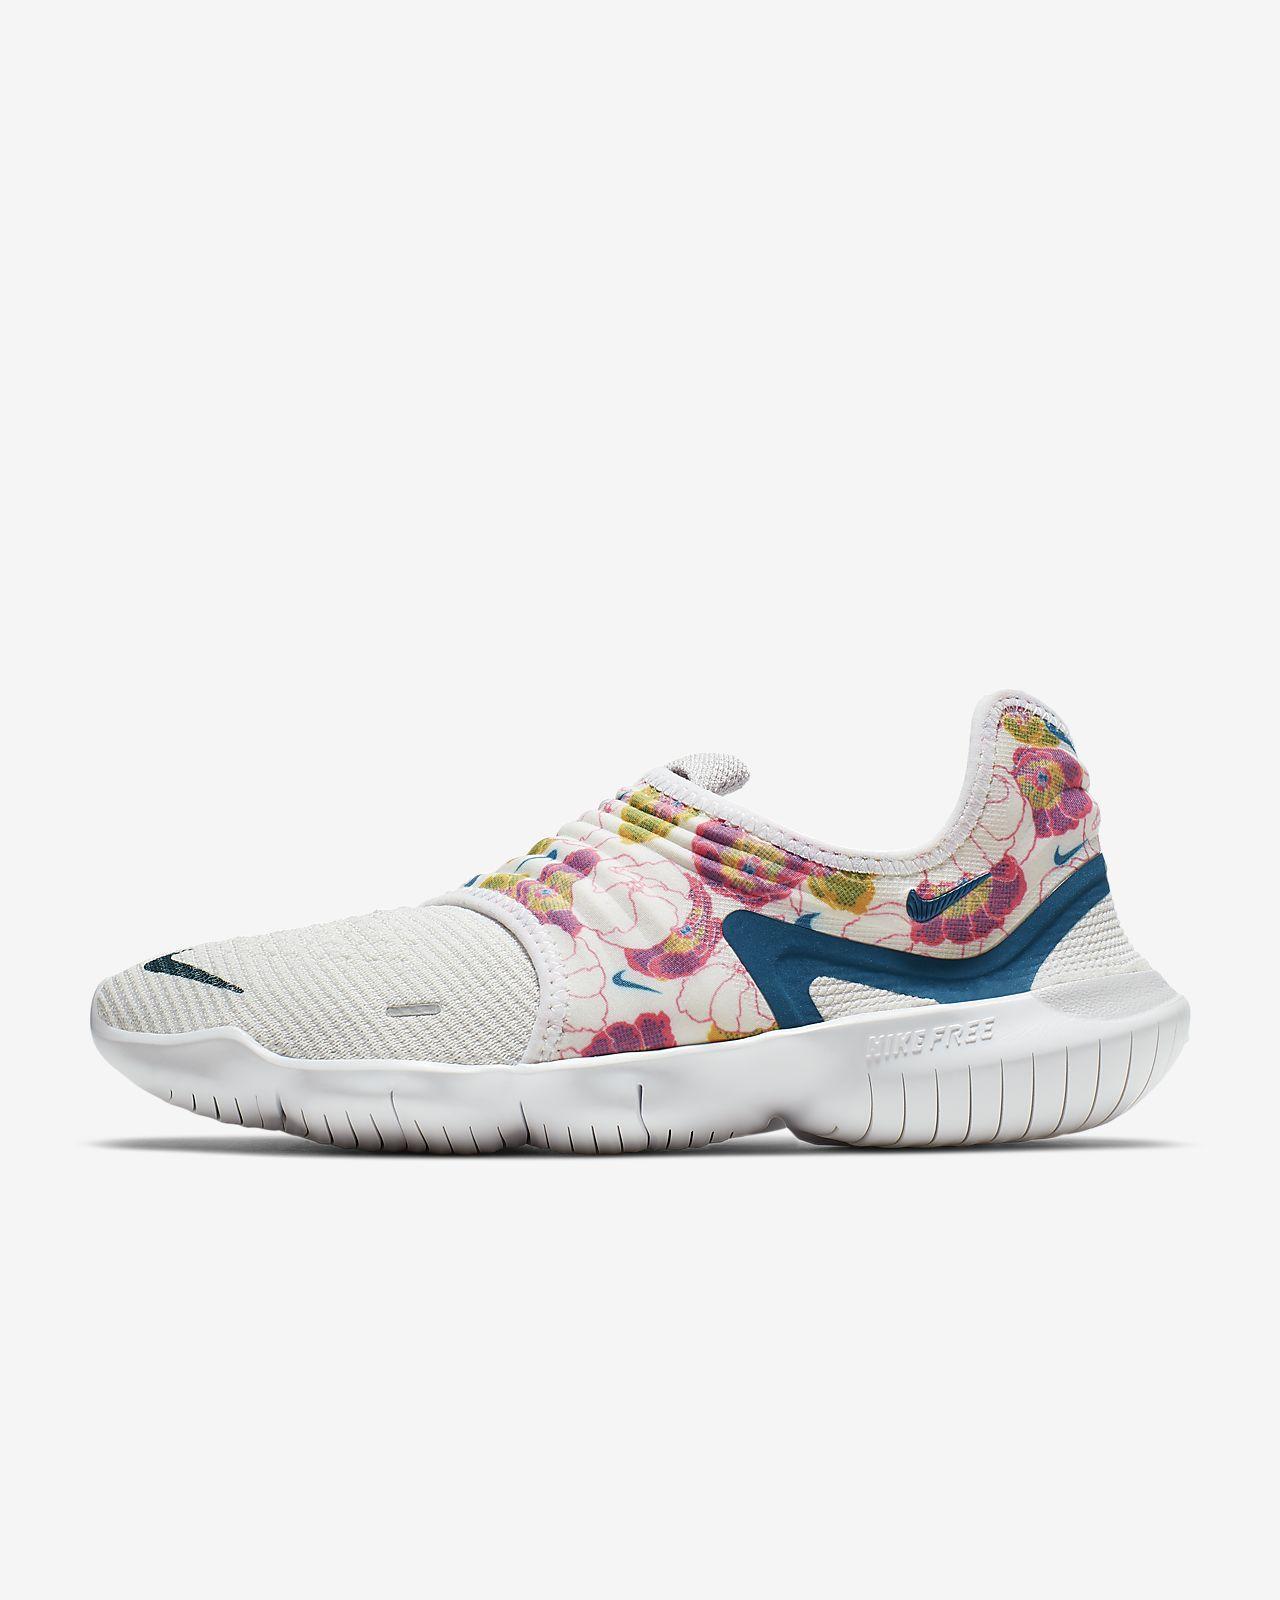 the latest 0b30e 992e9 Damskie buty do biegania Nike Free RN Flyknit 3.0. Nike.com PL